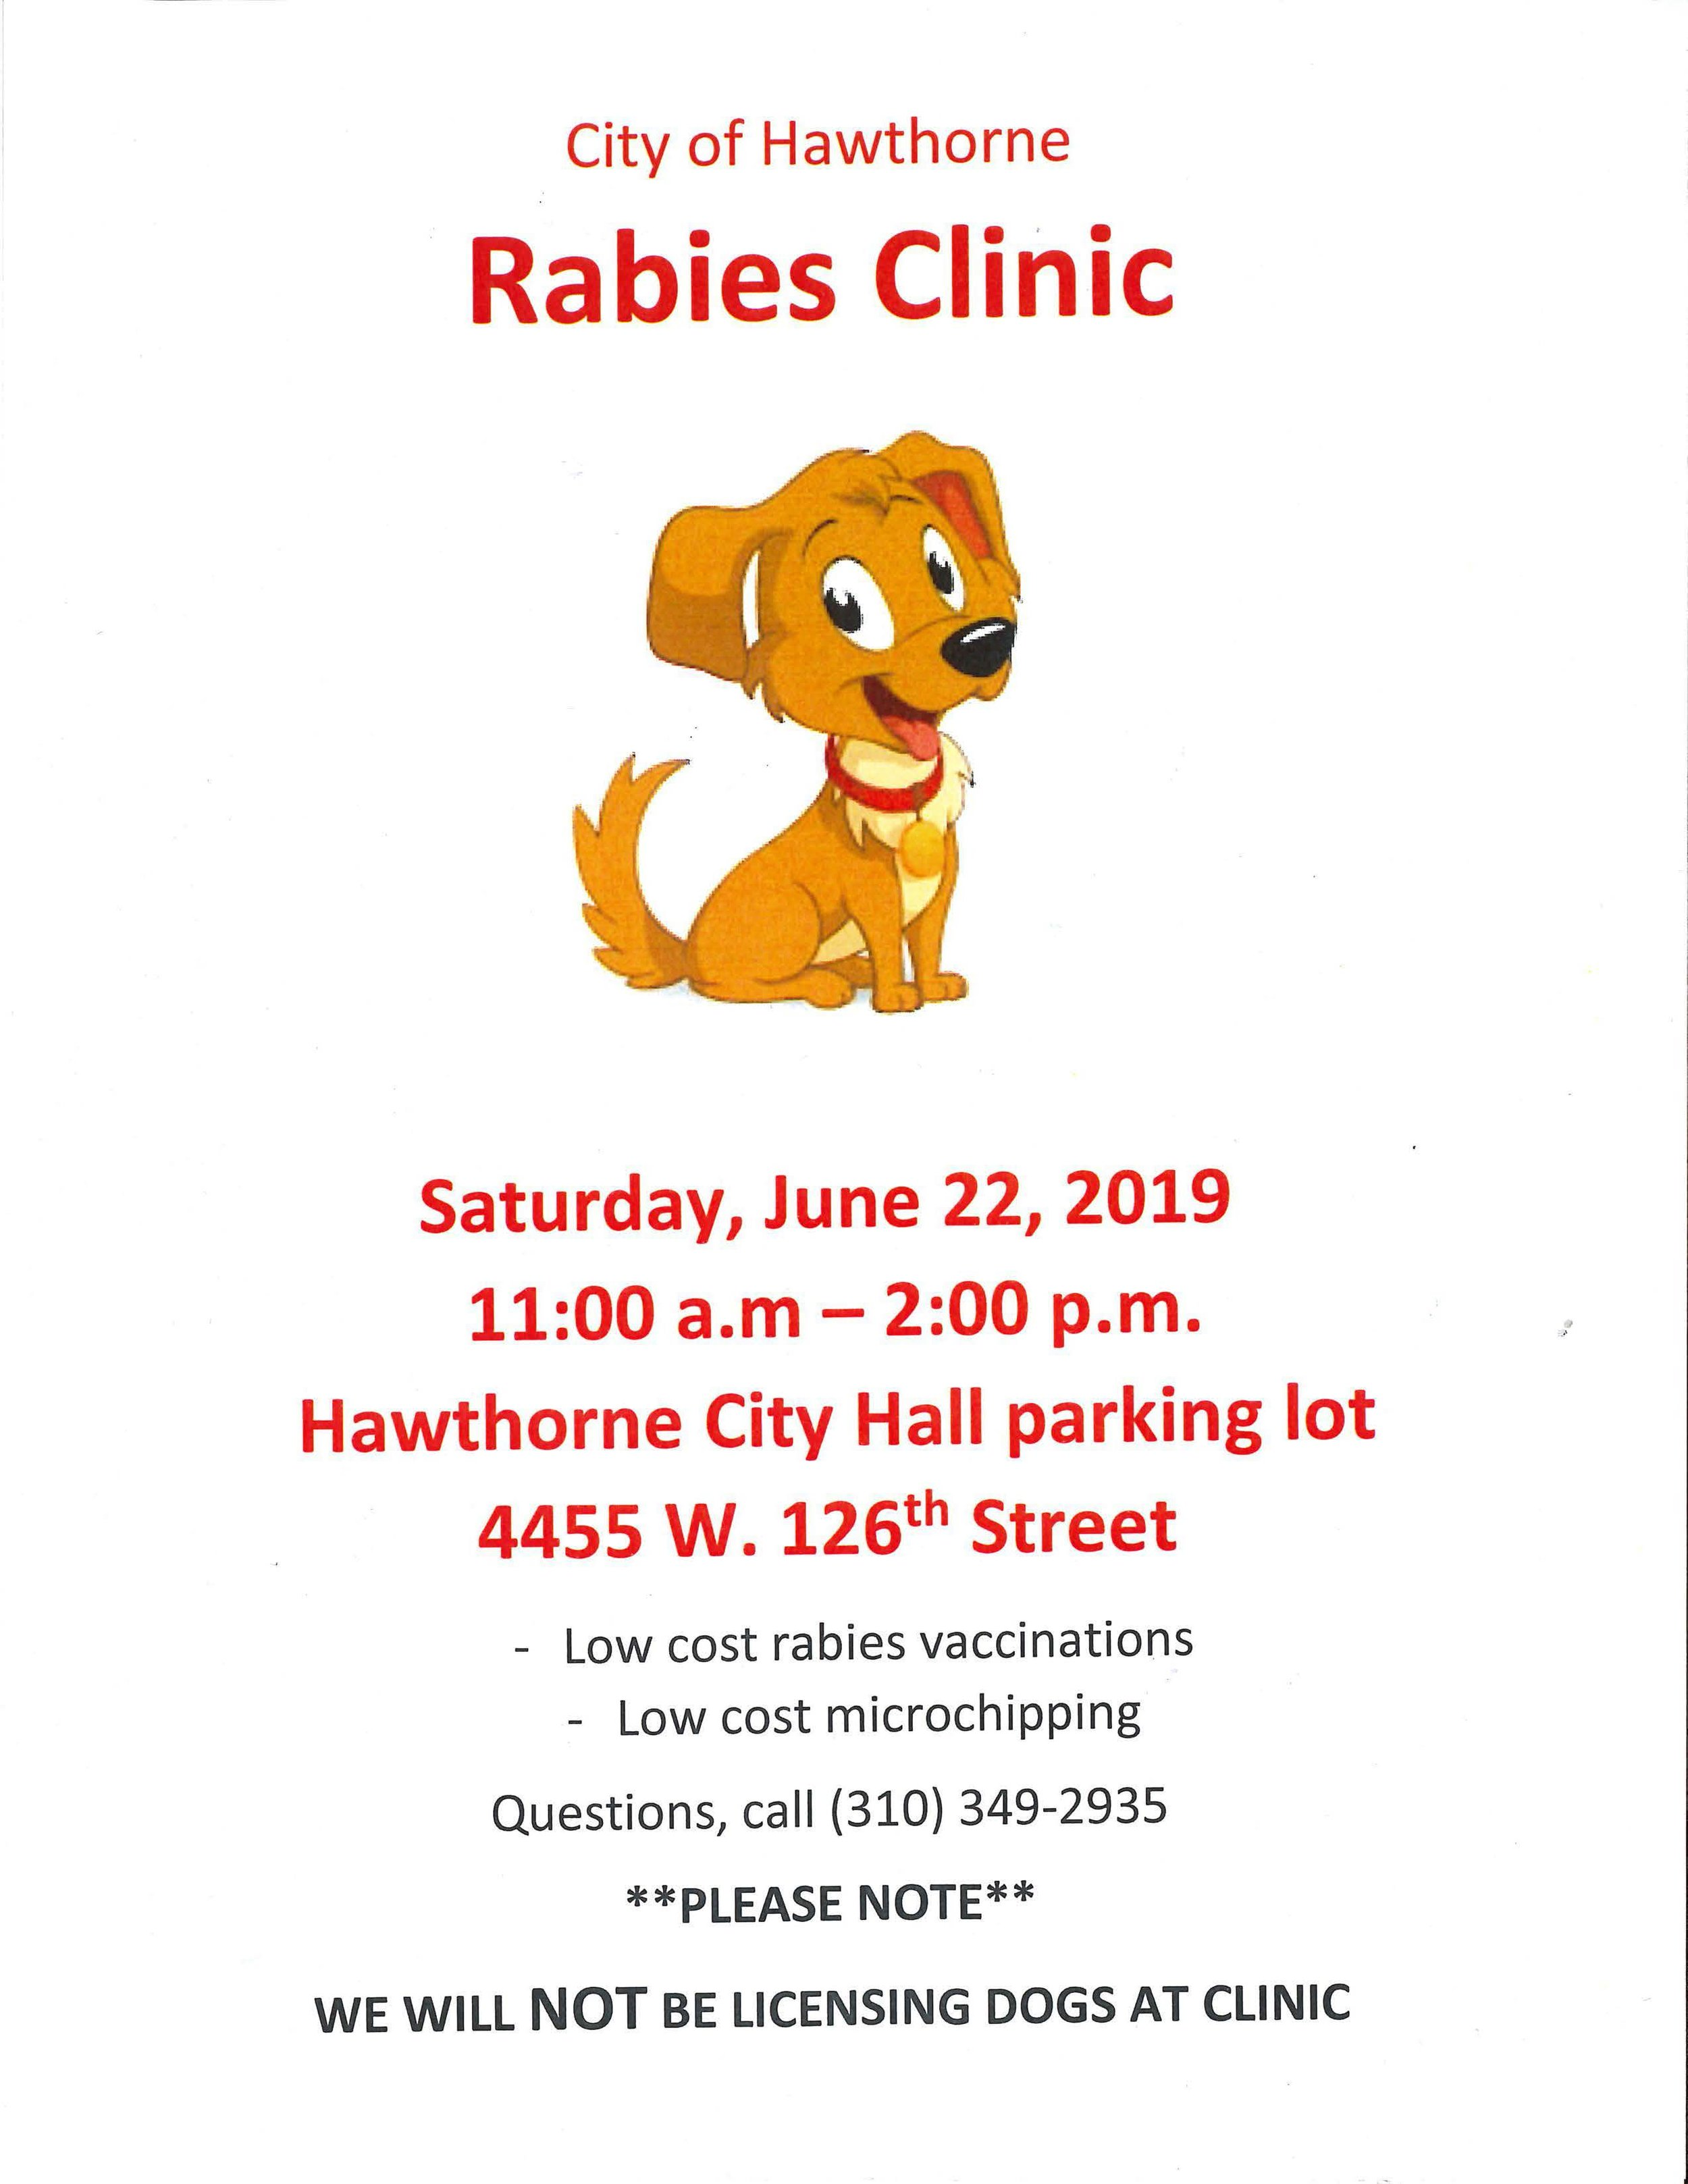 City of Hawthorne Rabies Clinic